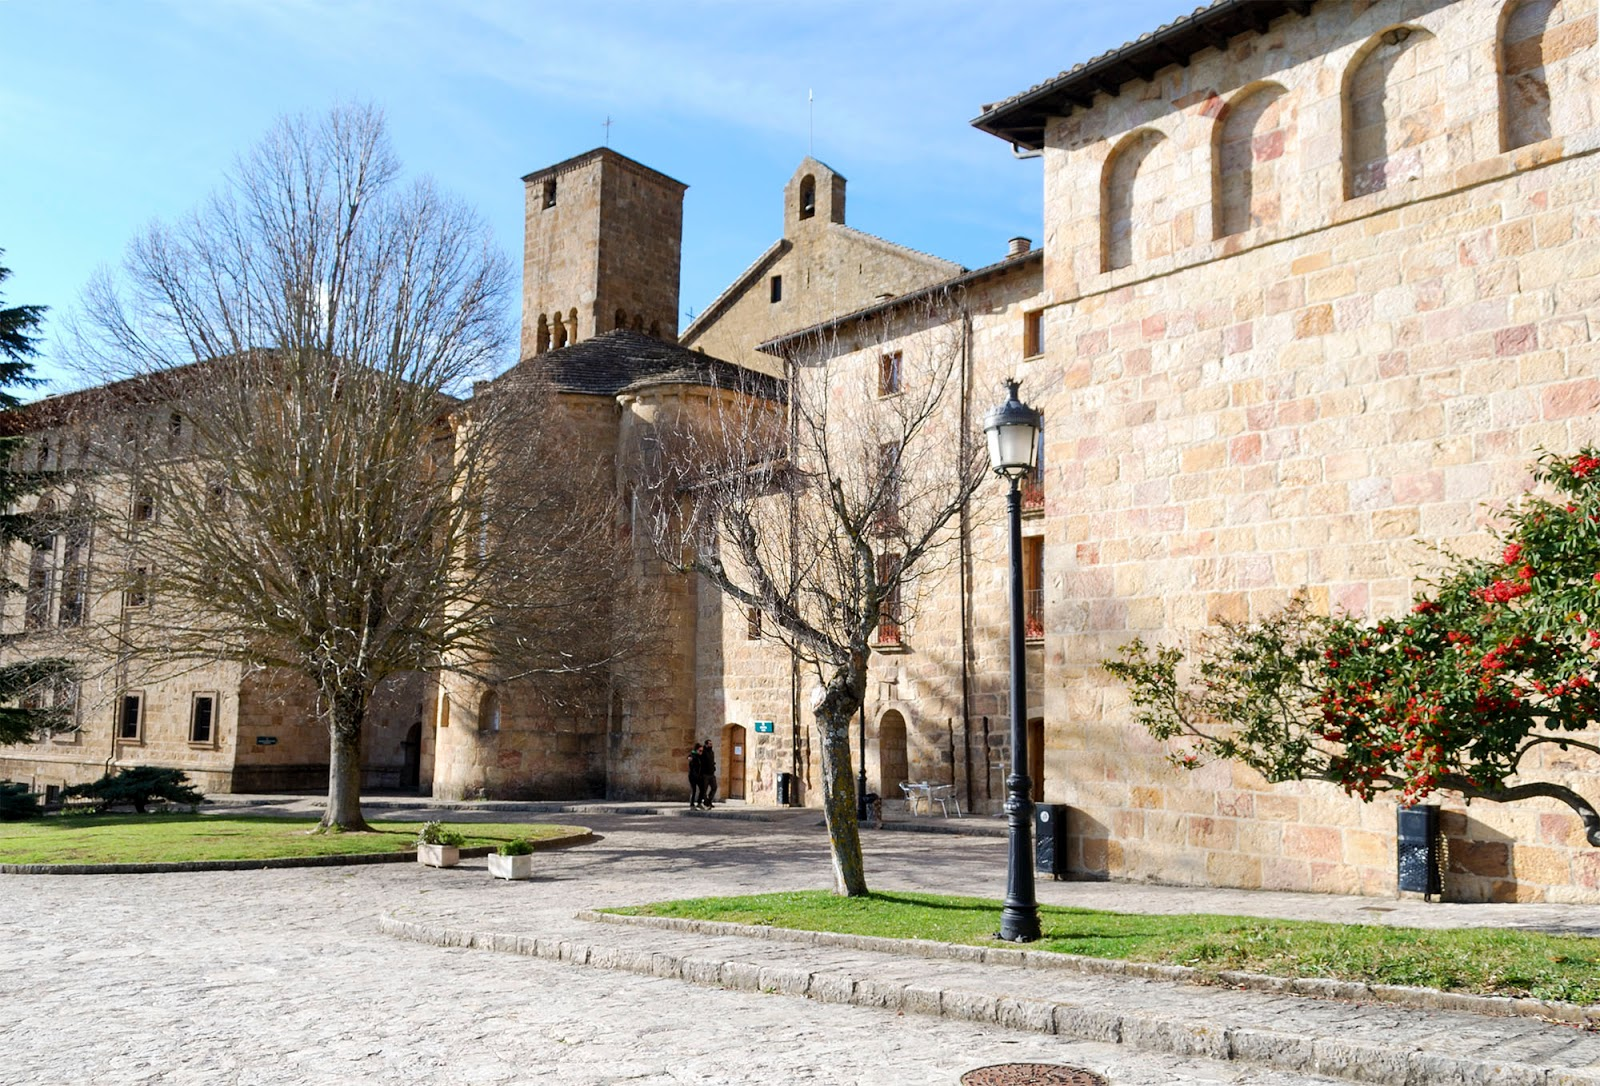 monasterio leyre navarra spain